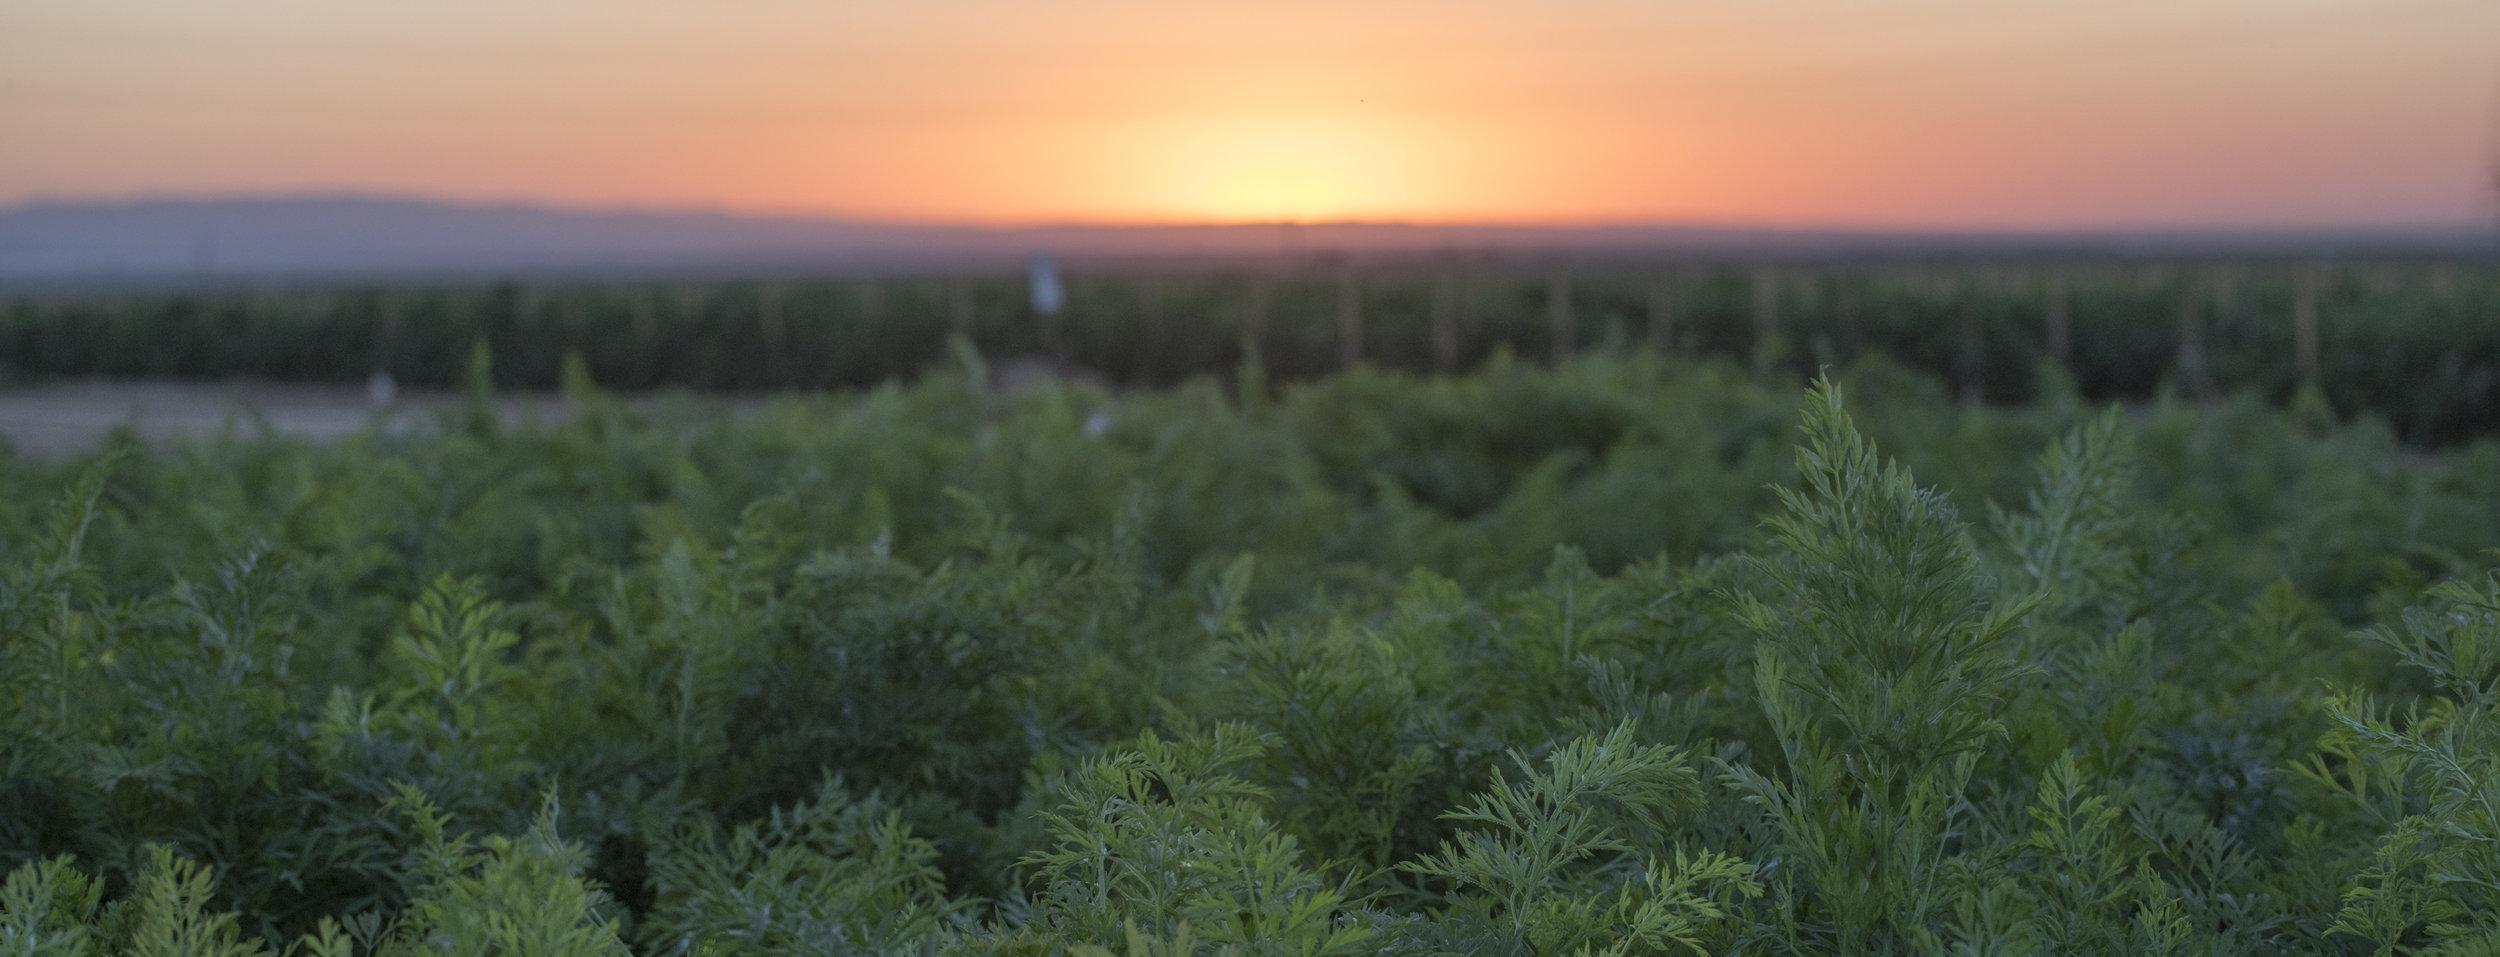 Bolthouse_Sunset-6590.jpg